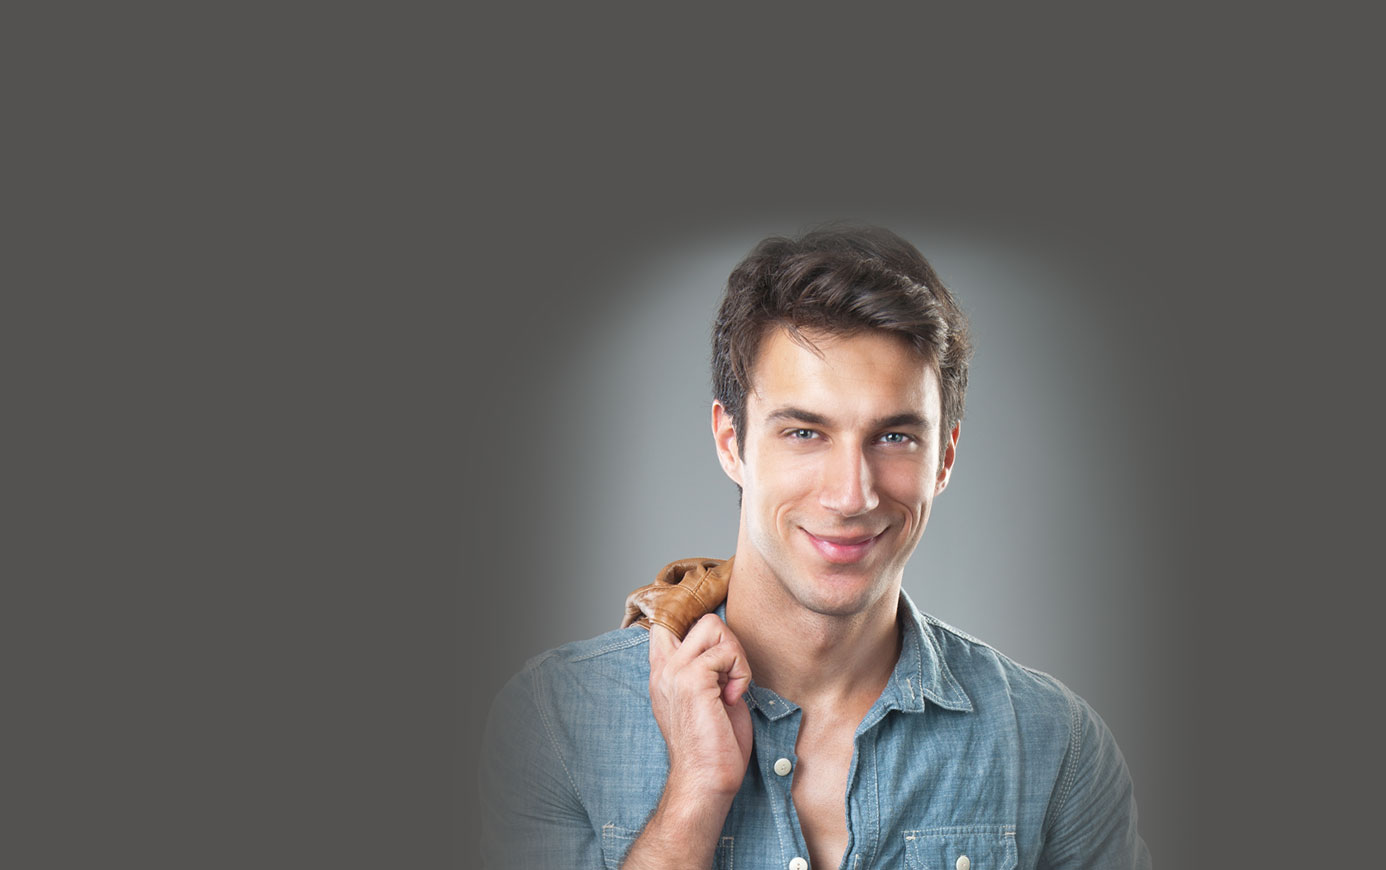 Male Chin Augmentation model